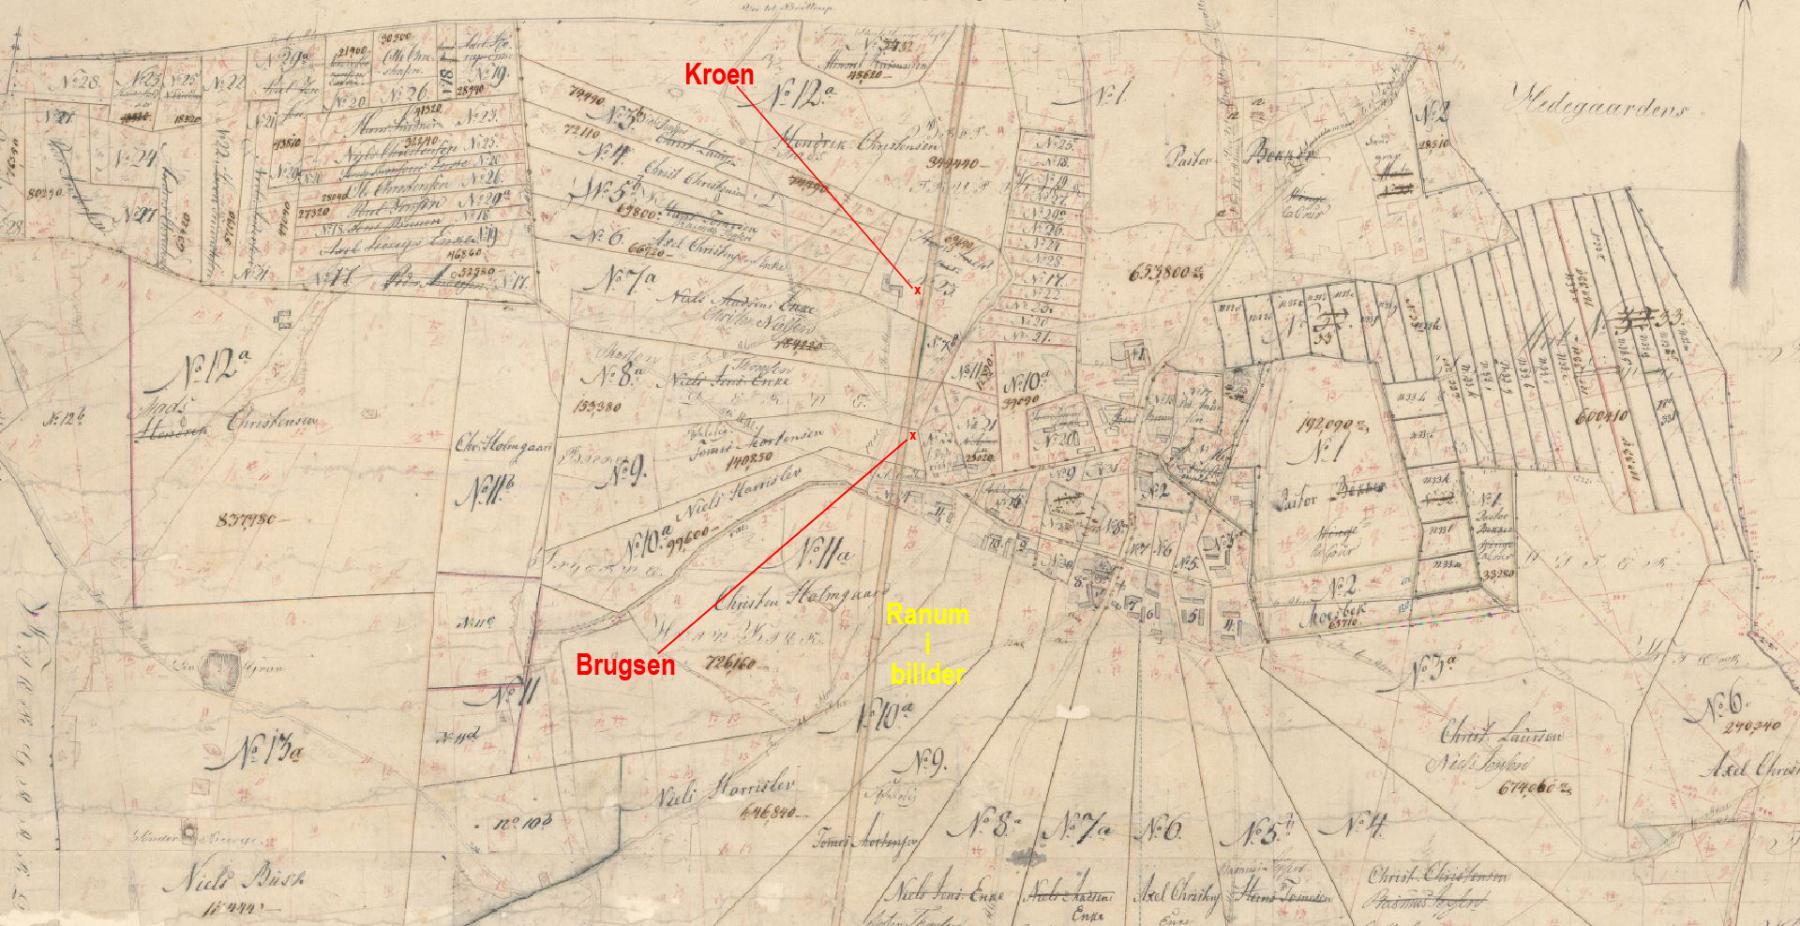 Matrikelkort 1814 til 1859